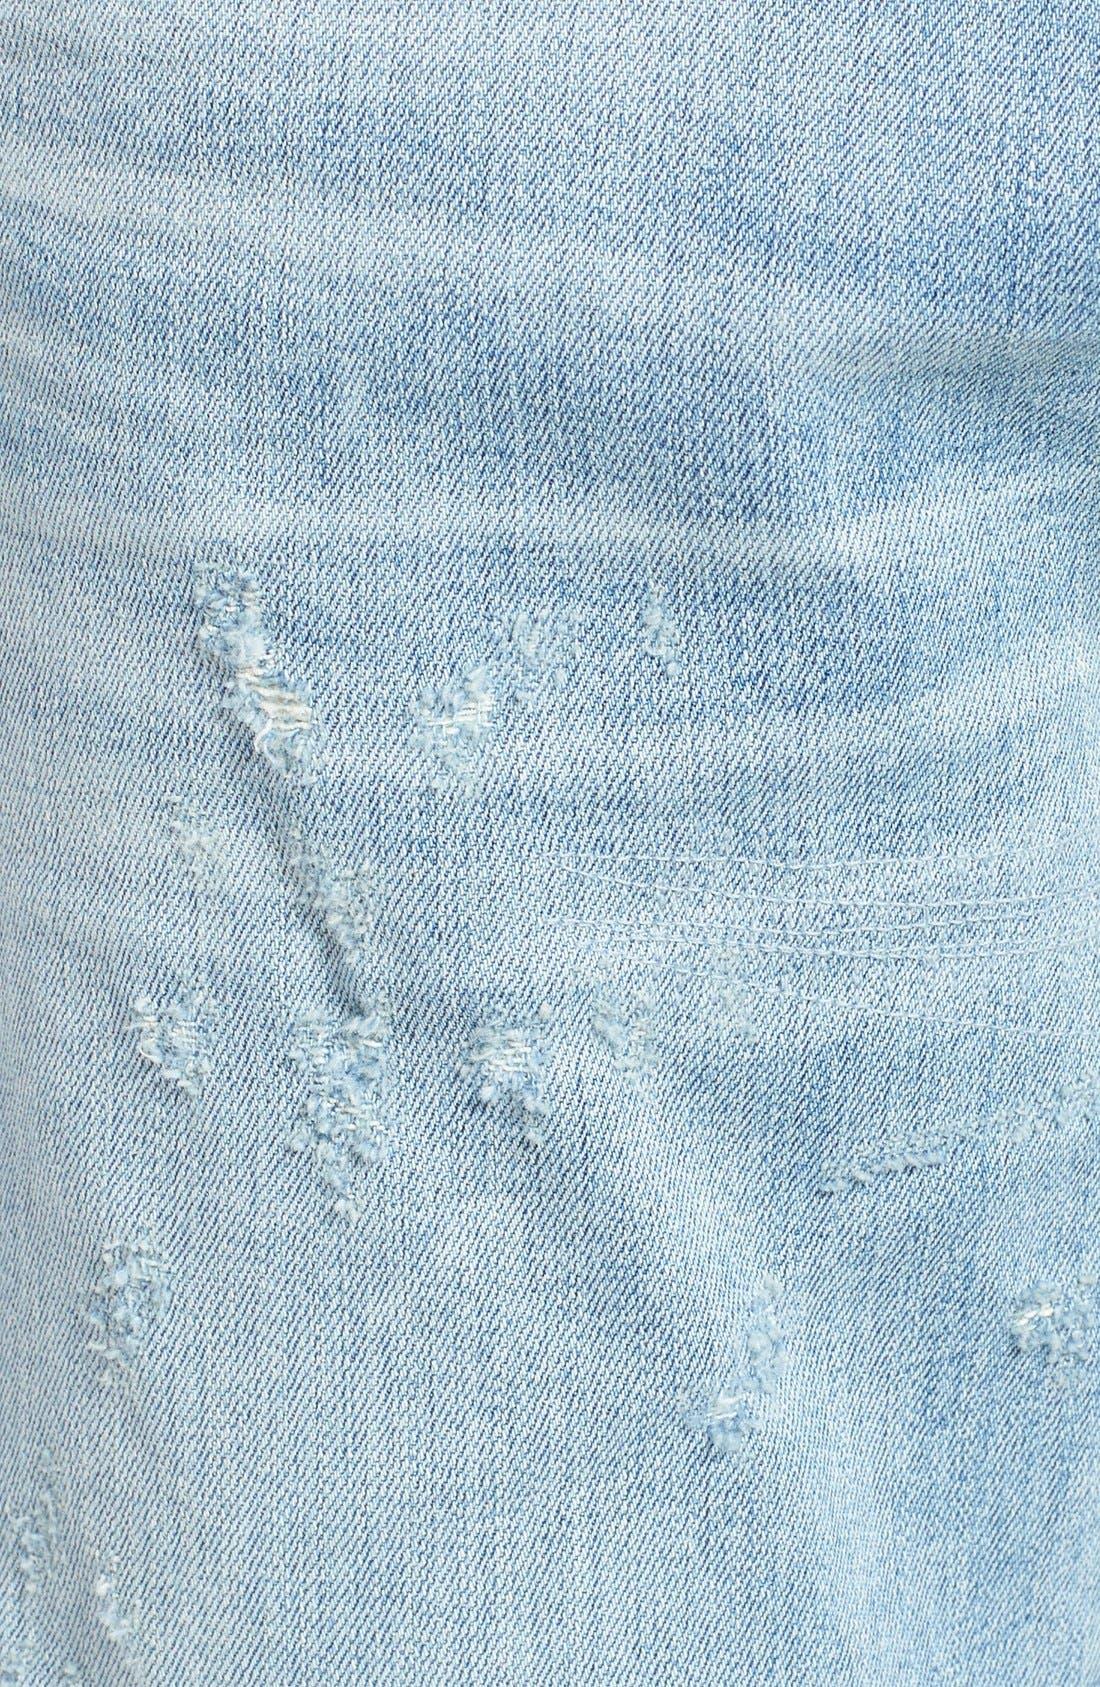 Alternate Image 6  - AGOLDE Skinny Fit Distressed Jeans (Pixx) (Men)